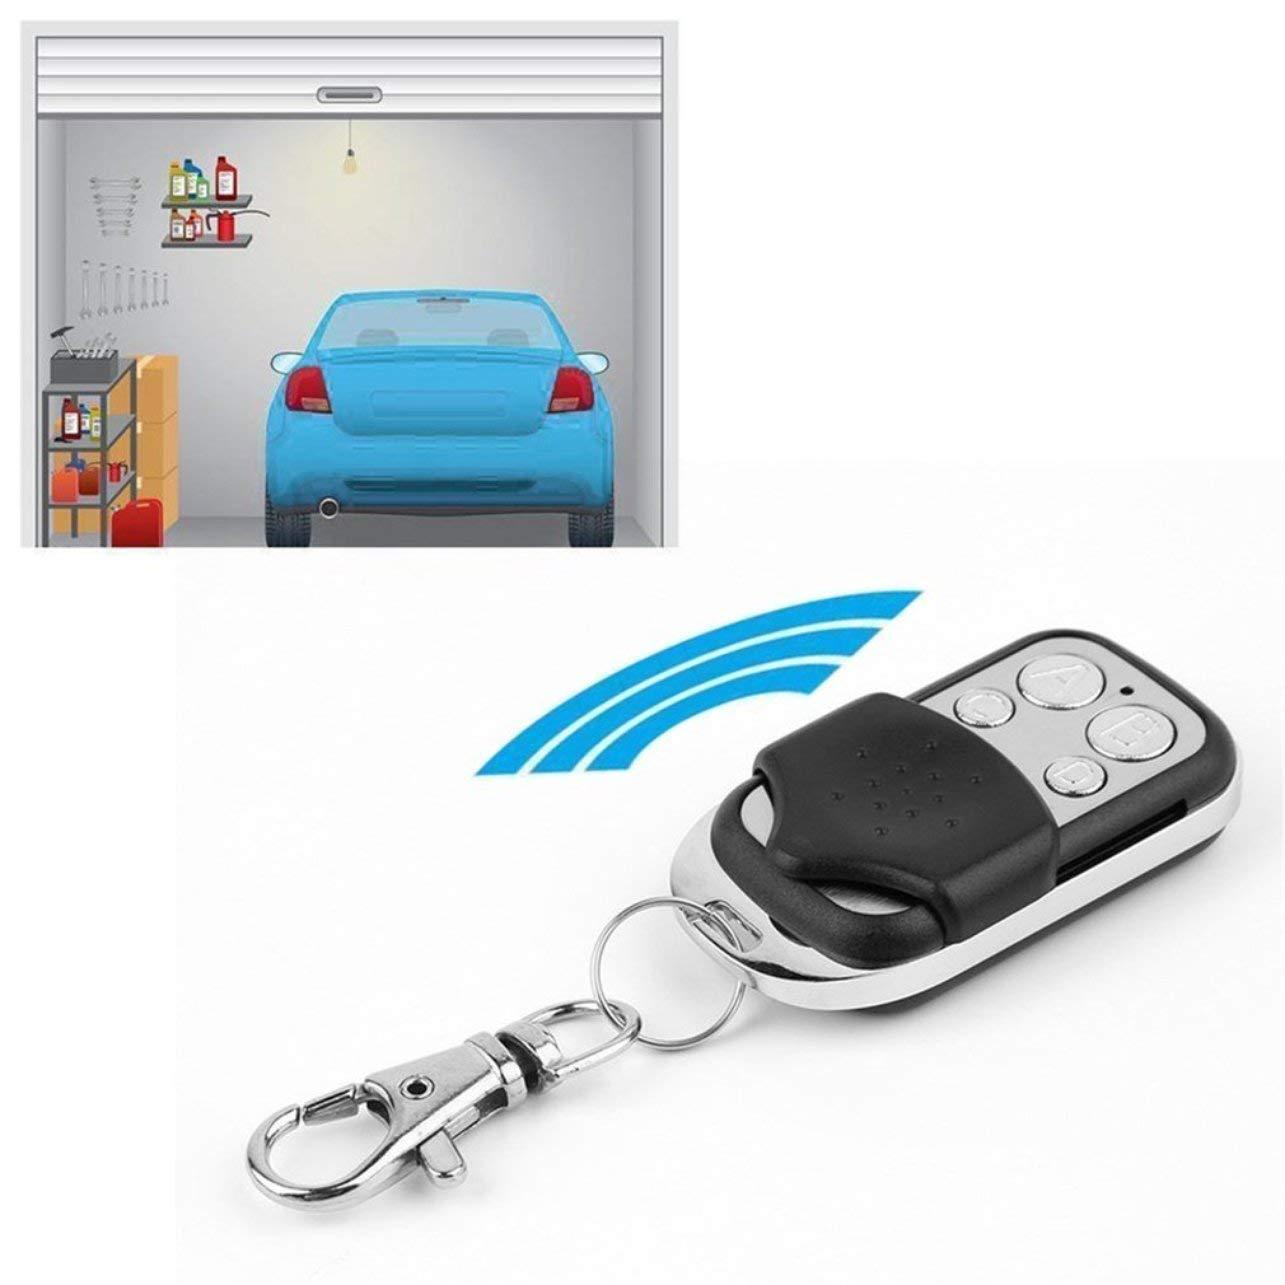 433 MHz RF 4 canales clonaci/ón Duplicator Key Fob Un controlador de puerta de garaje el/éctrico de aprendizaje a distancia IC modelo 2262 2260 1527 2240